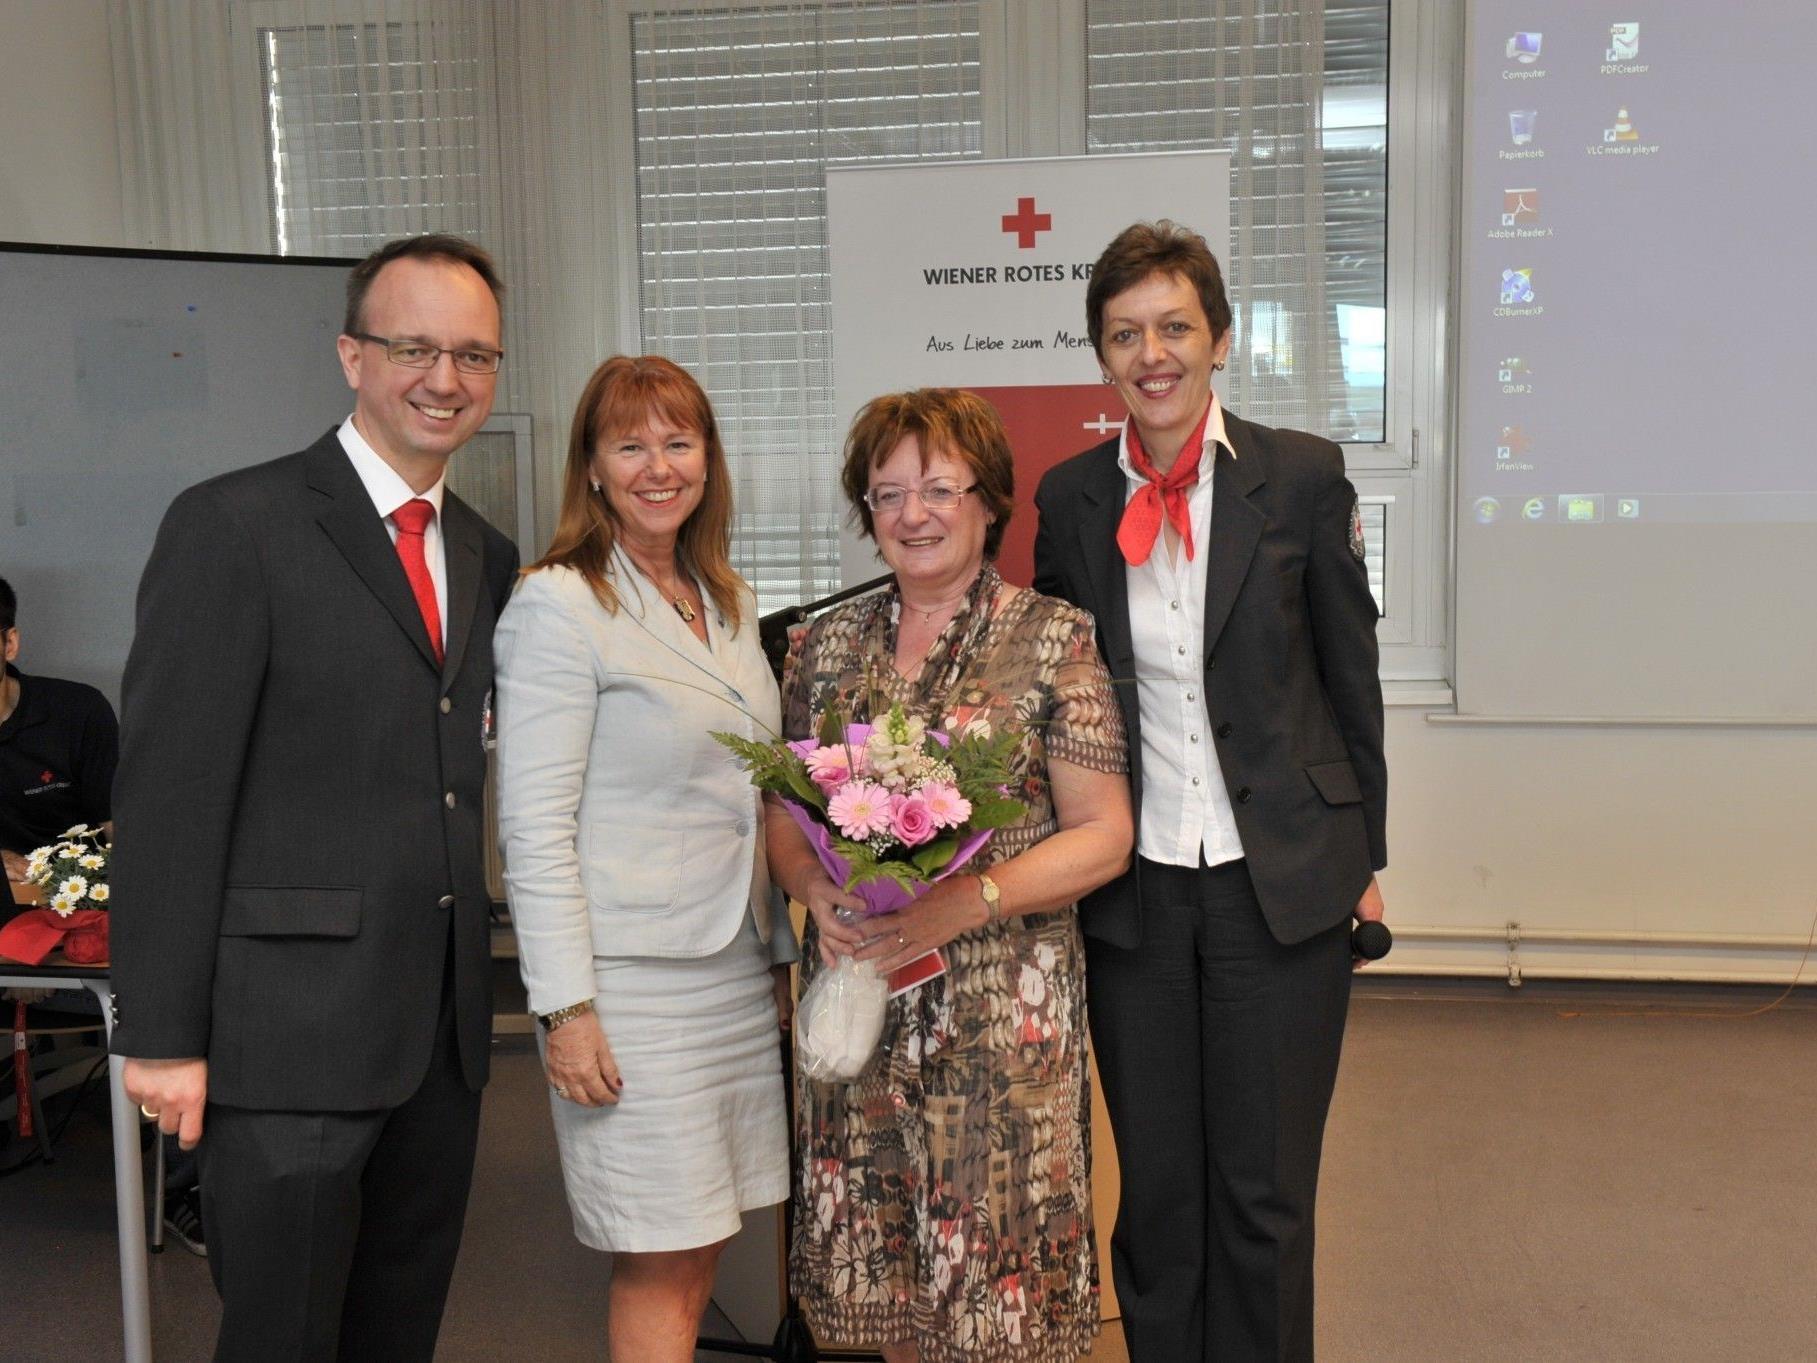 Geschäftsführer Alexander Lang, Angelika Rosenberger-Spitzy, Marianne Klicka, Gabriele Sprengseis, Leiterin Ausbildungszentrum